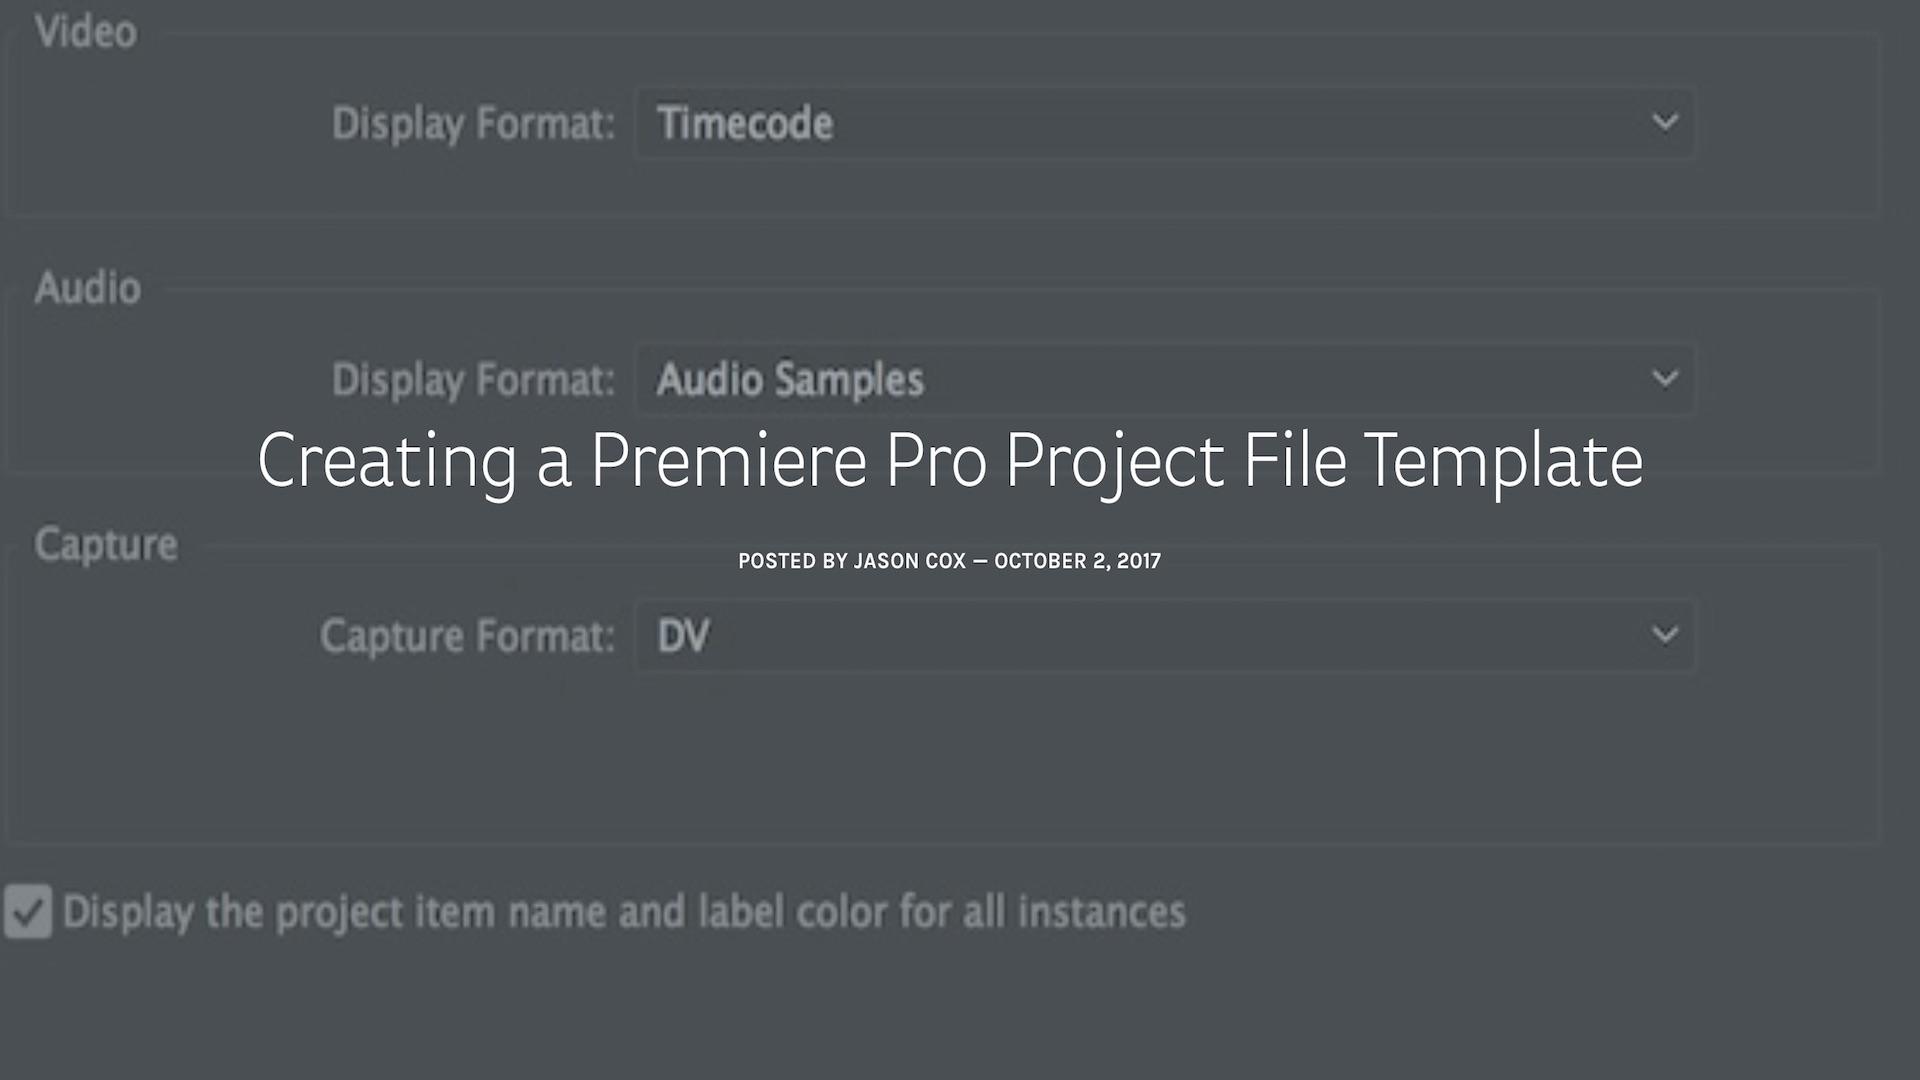 project-file-template-premiere-pro.jpg